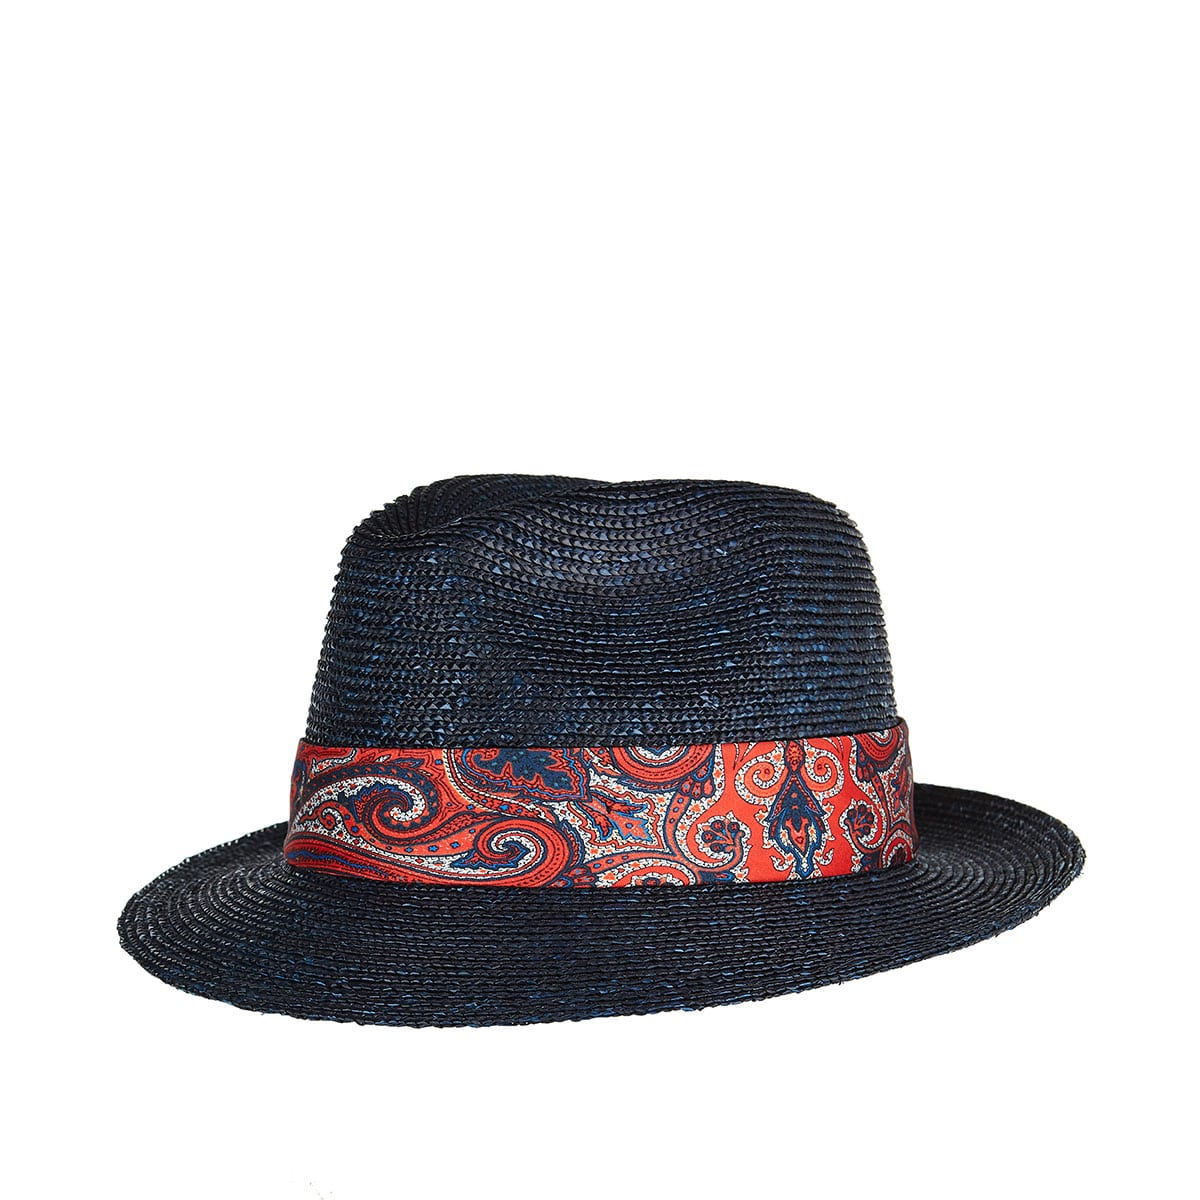 Paisley-band woven hat